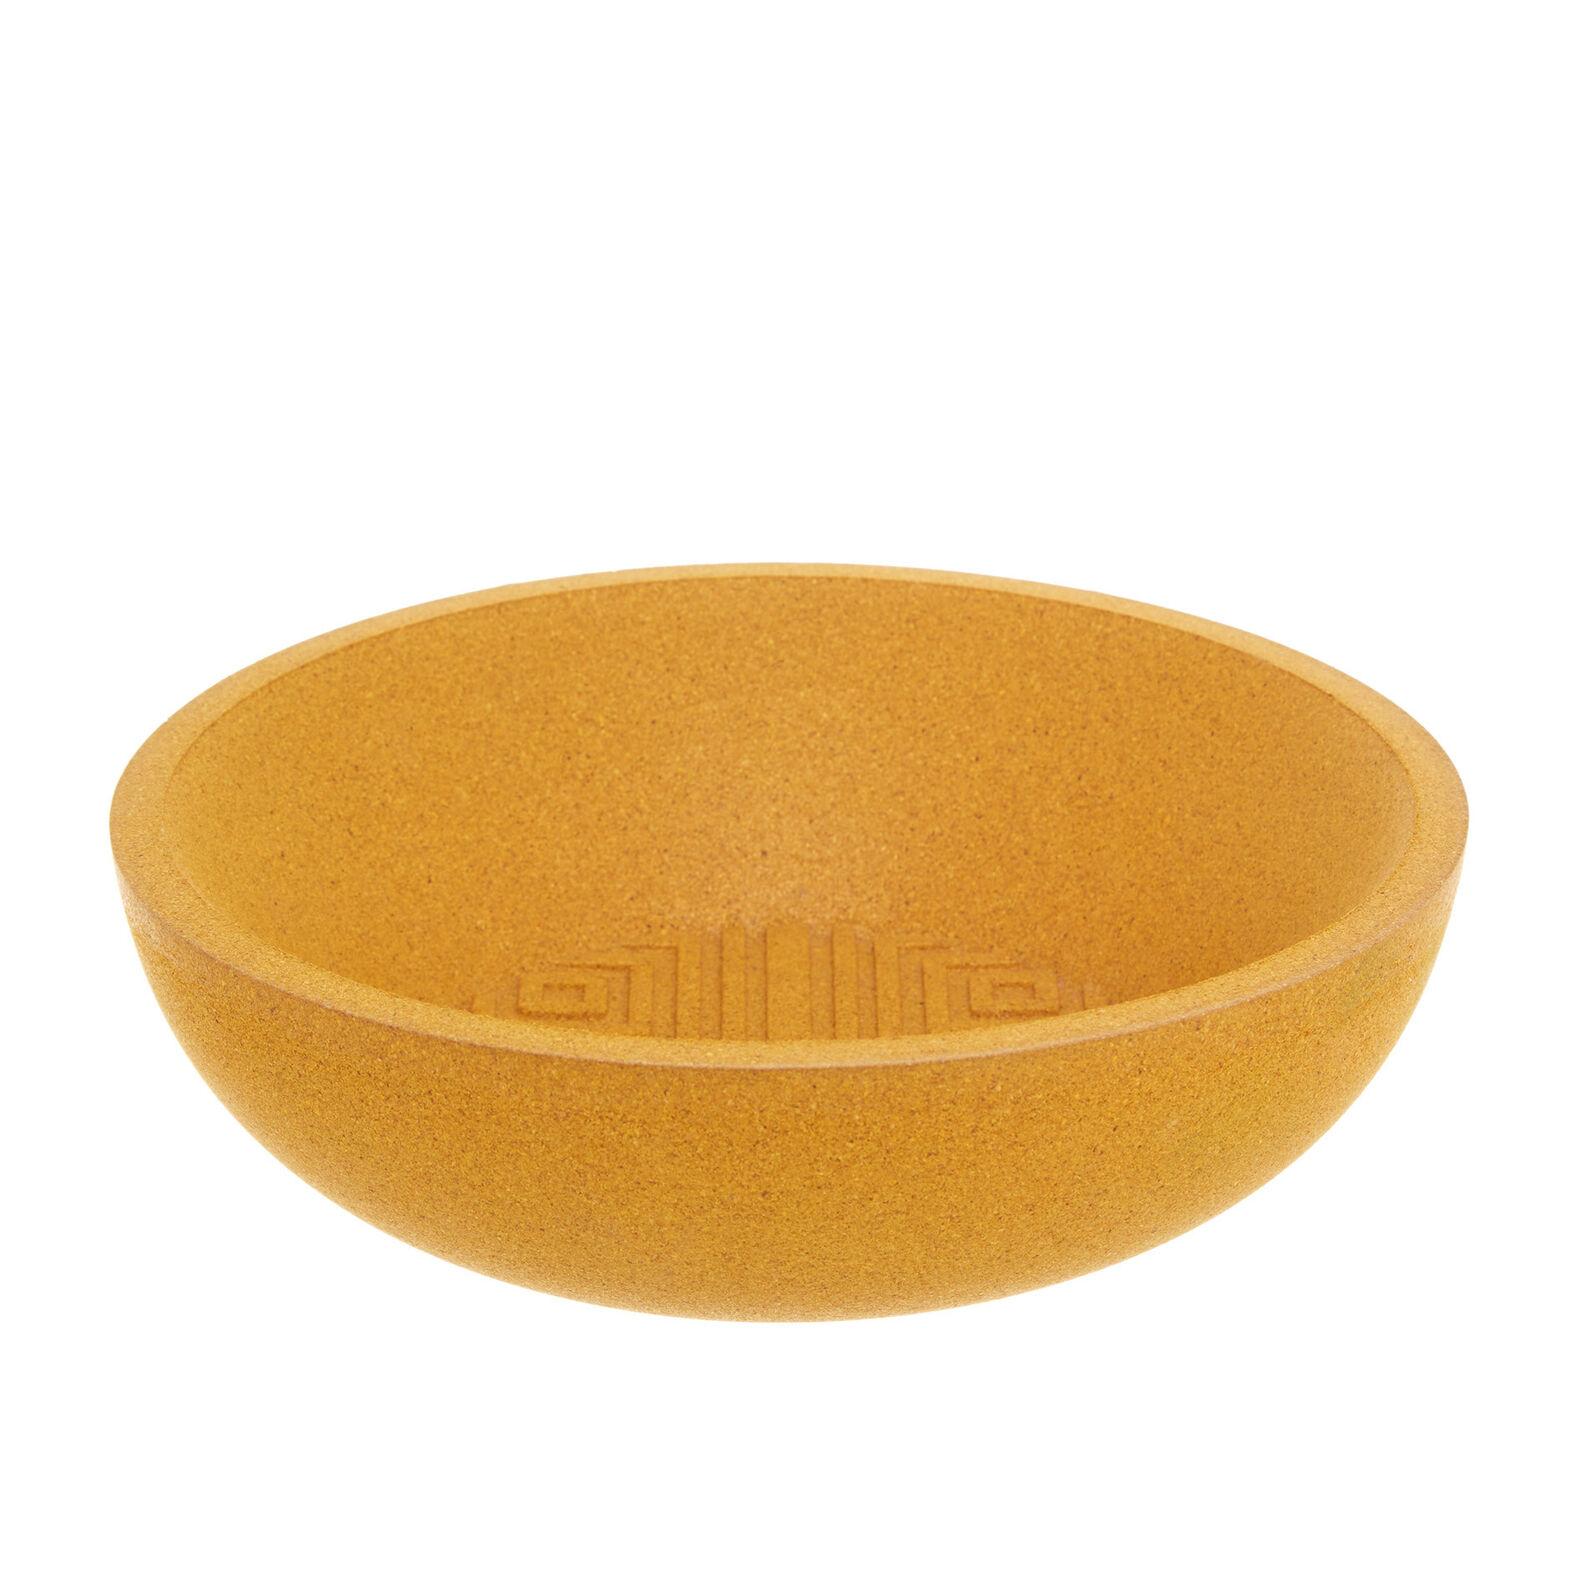 Portuguese natural cork bowl